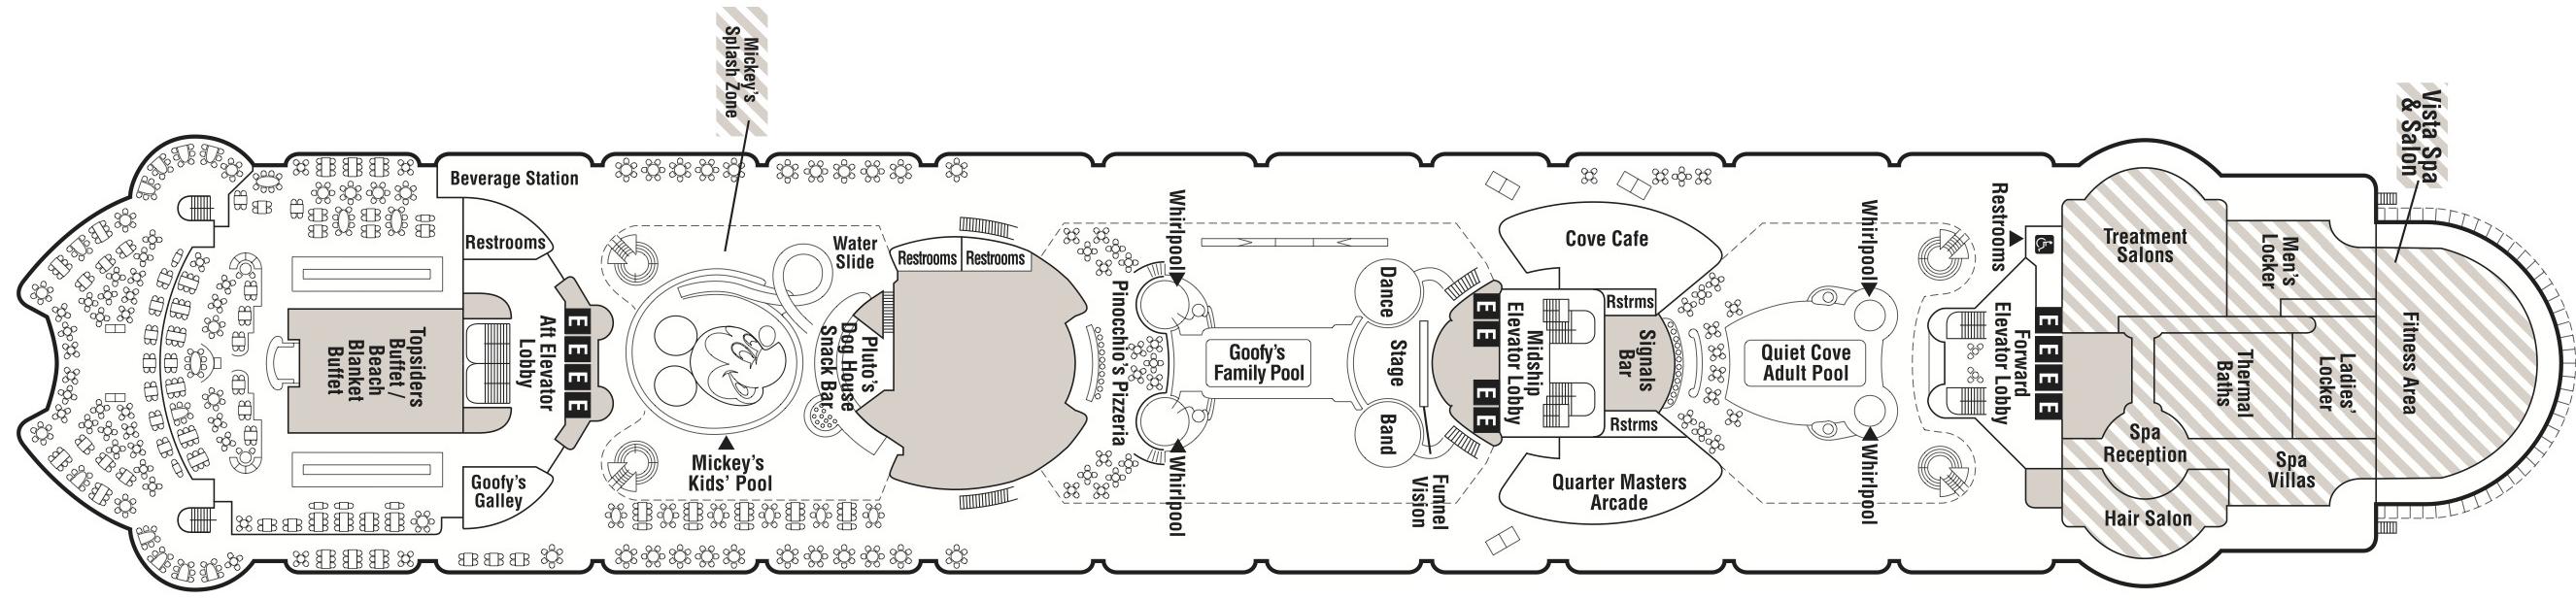 Disney Cruise Line Disney Magic & Disney Wonder Deck Plans Deck 9.png